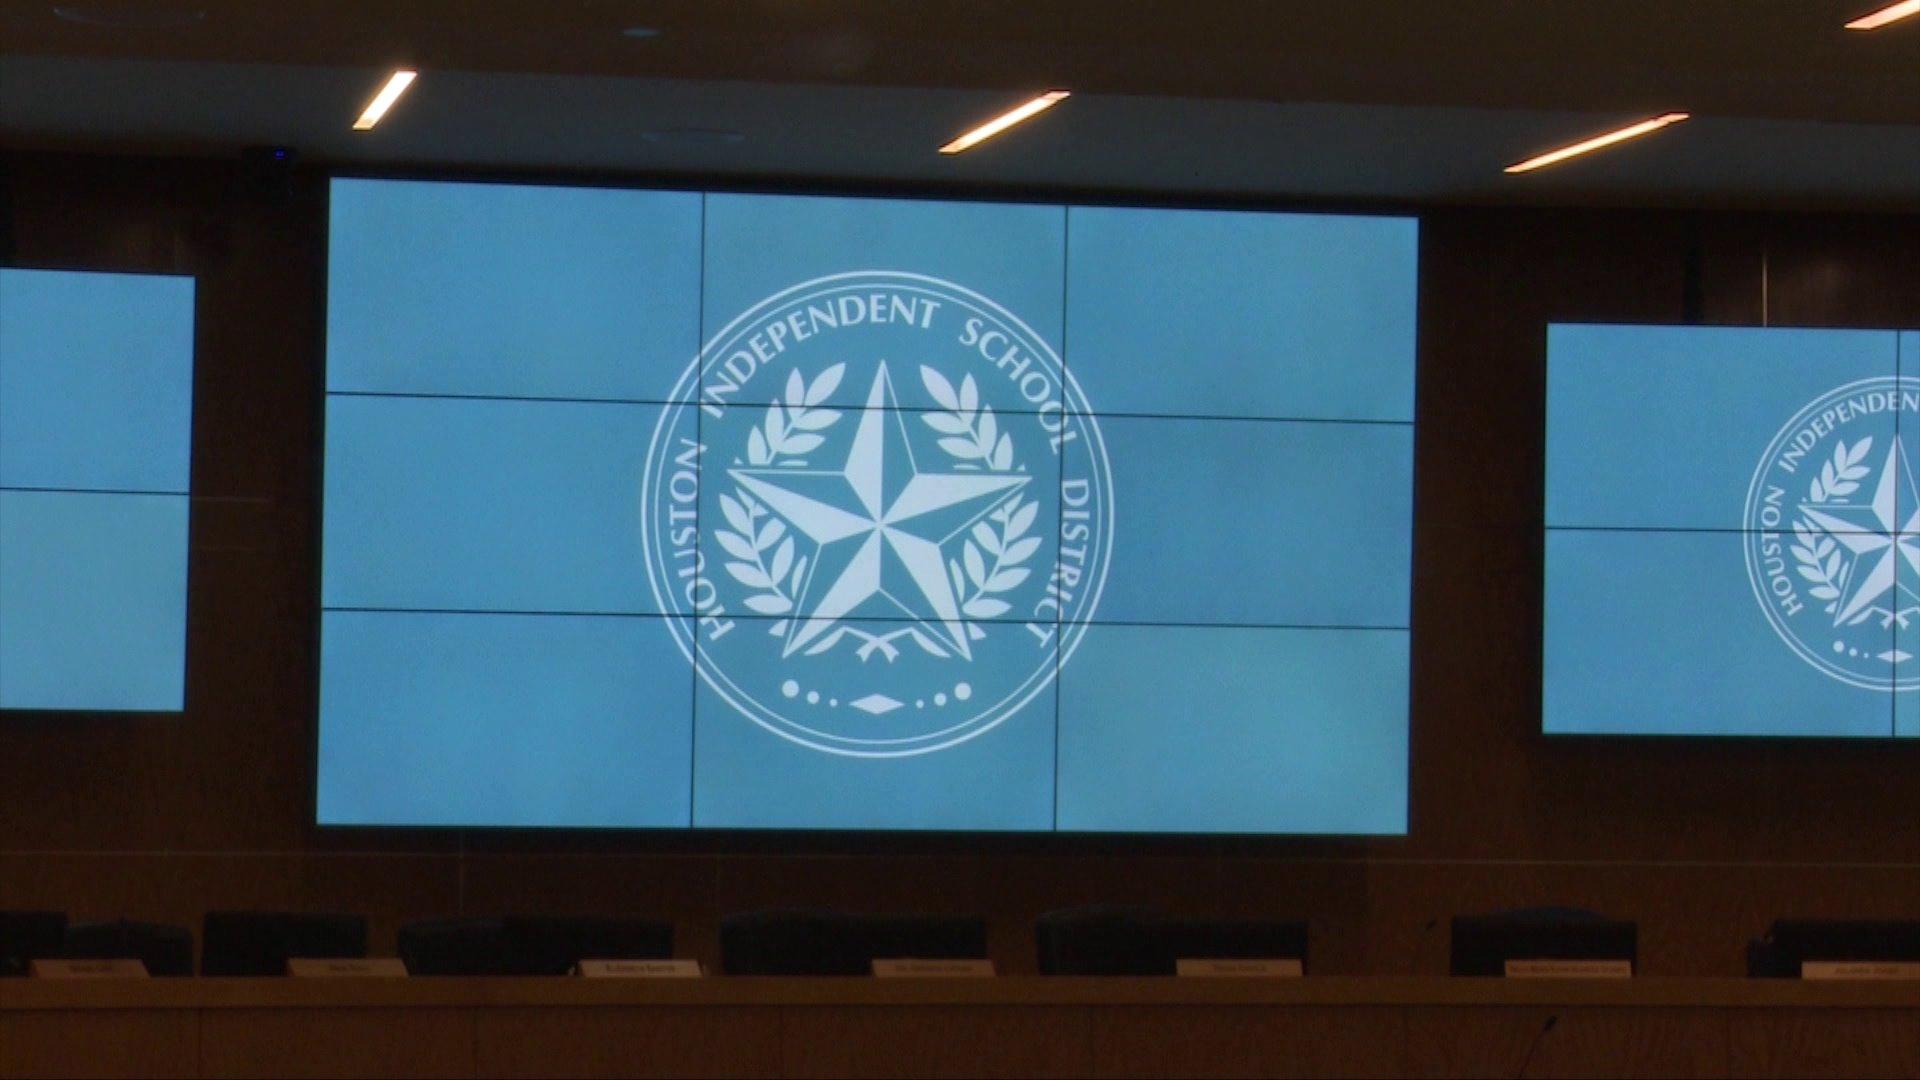 Hisd Proposing Year Round Academic Calendar For 2020 2021 Within Sam Houston Academic Calendar